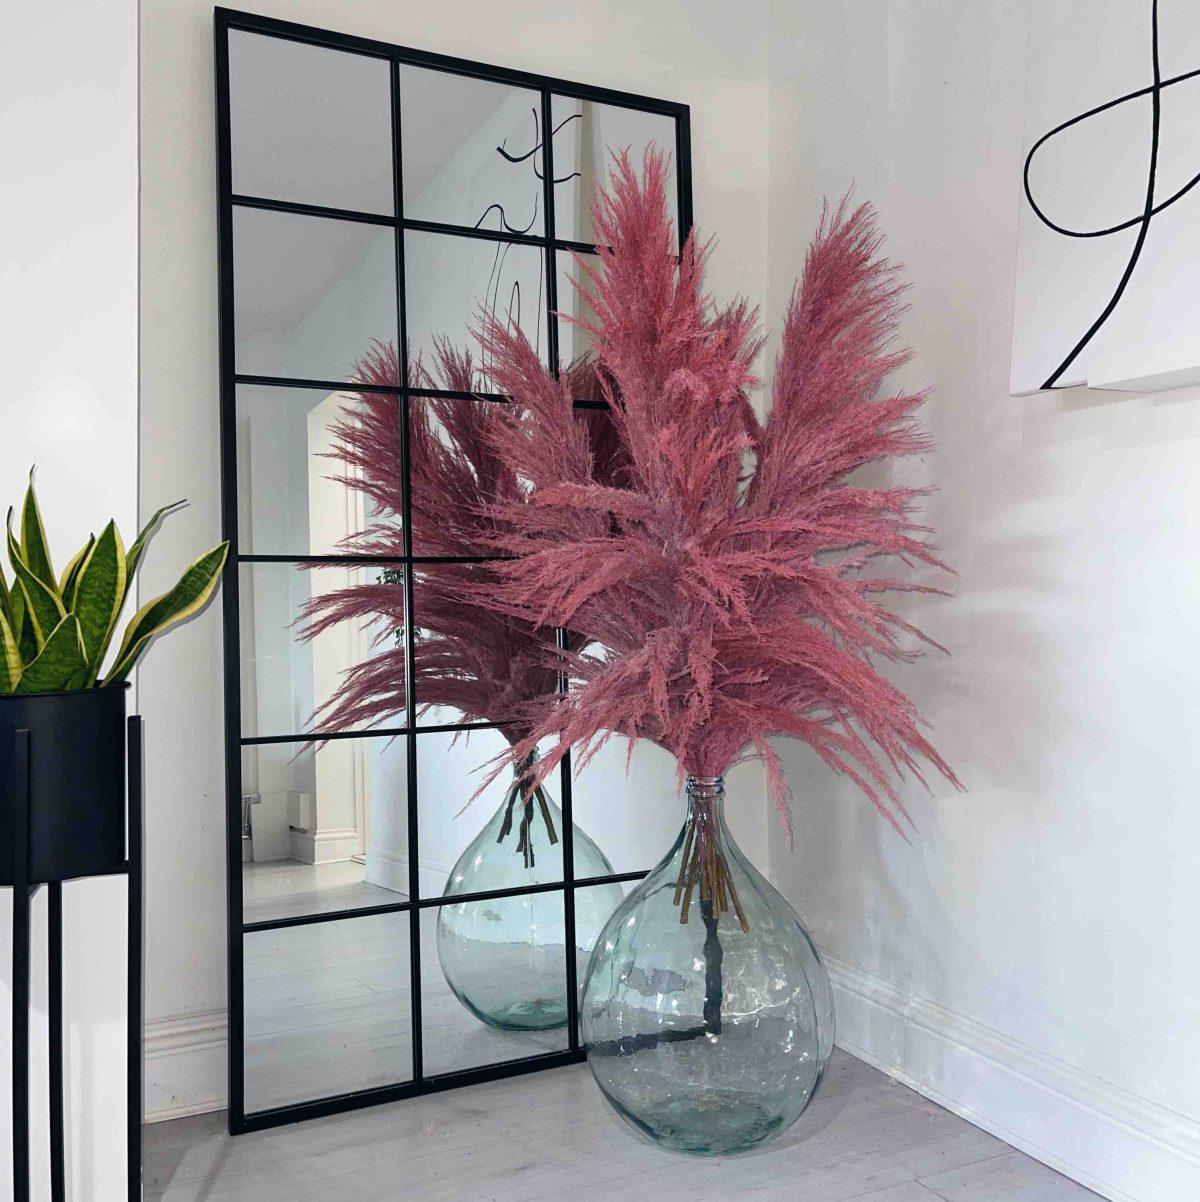 pink pampas, huge pink pampas, pink dried pampas, fluffy pink pampas, tall pink pampas, pampas cloud, pink pamaps cloud, pink decor, recycled glass vase